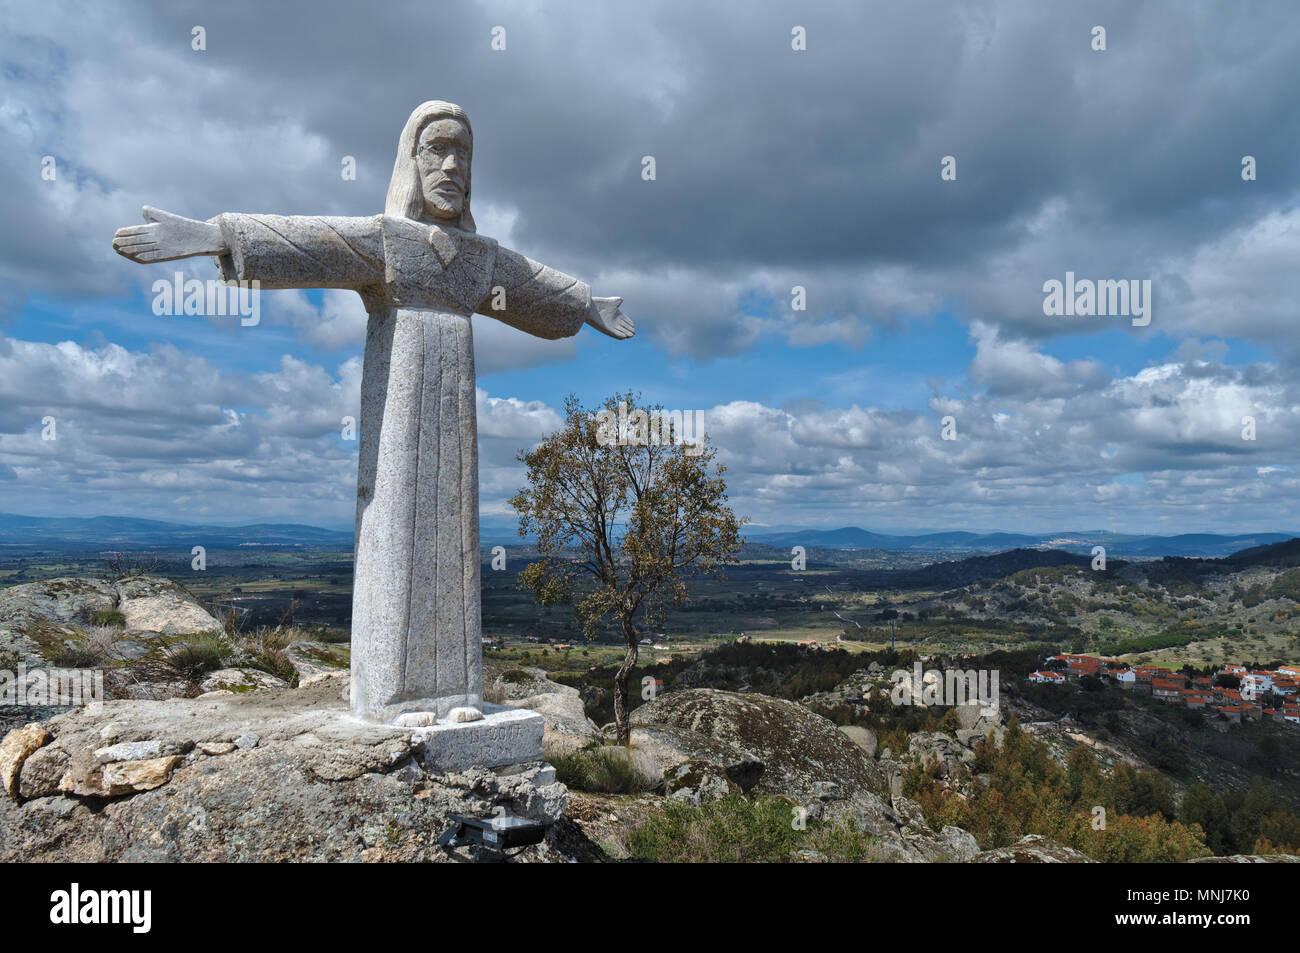 Christ Statue in Monsanto Mountains. Castelo Branco, Portugal Stock Photo